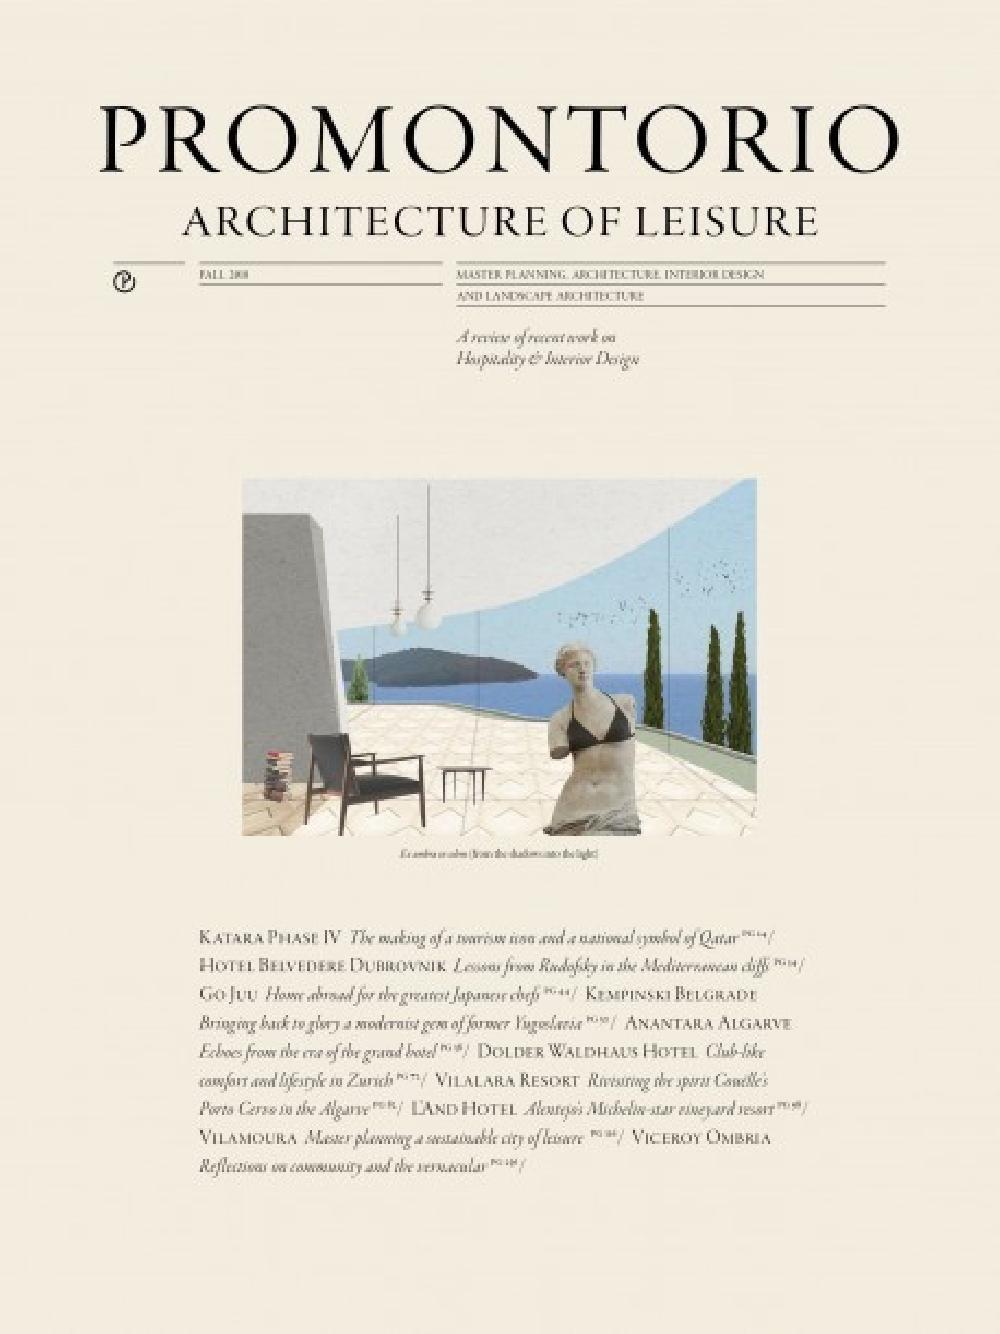 Promontorio: Architecture of Leisure